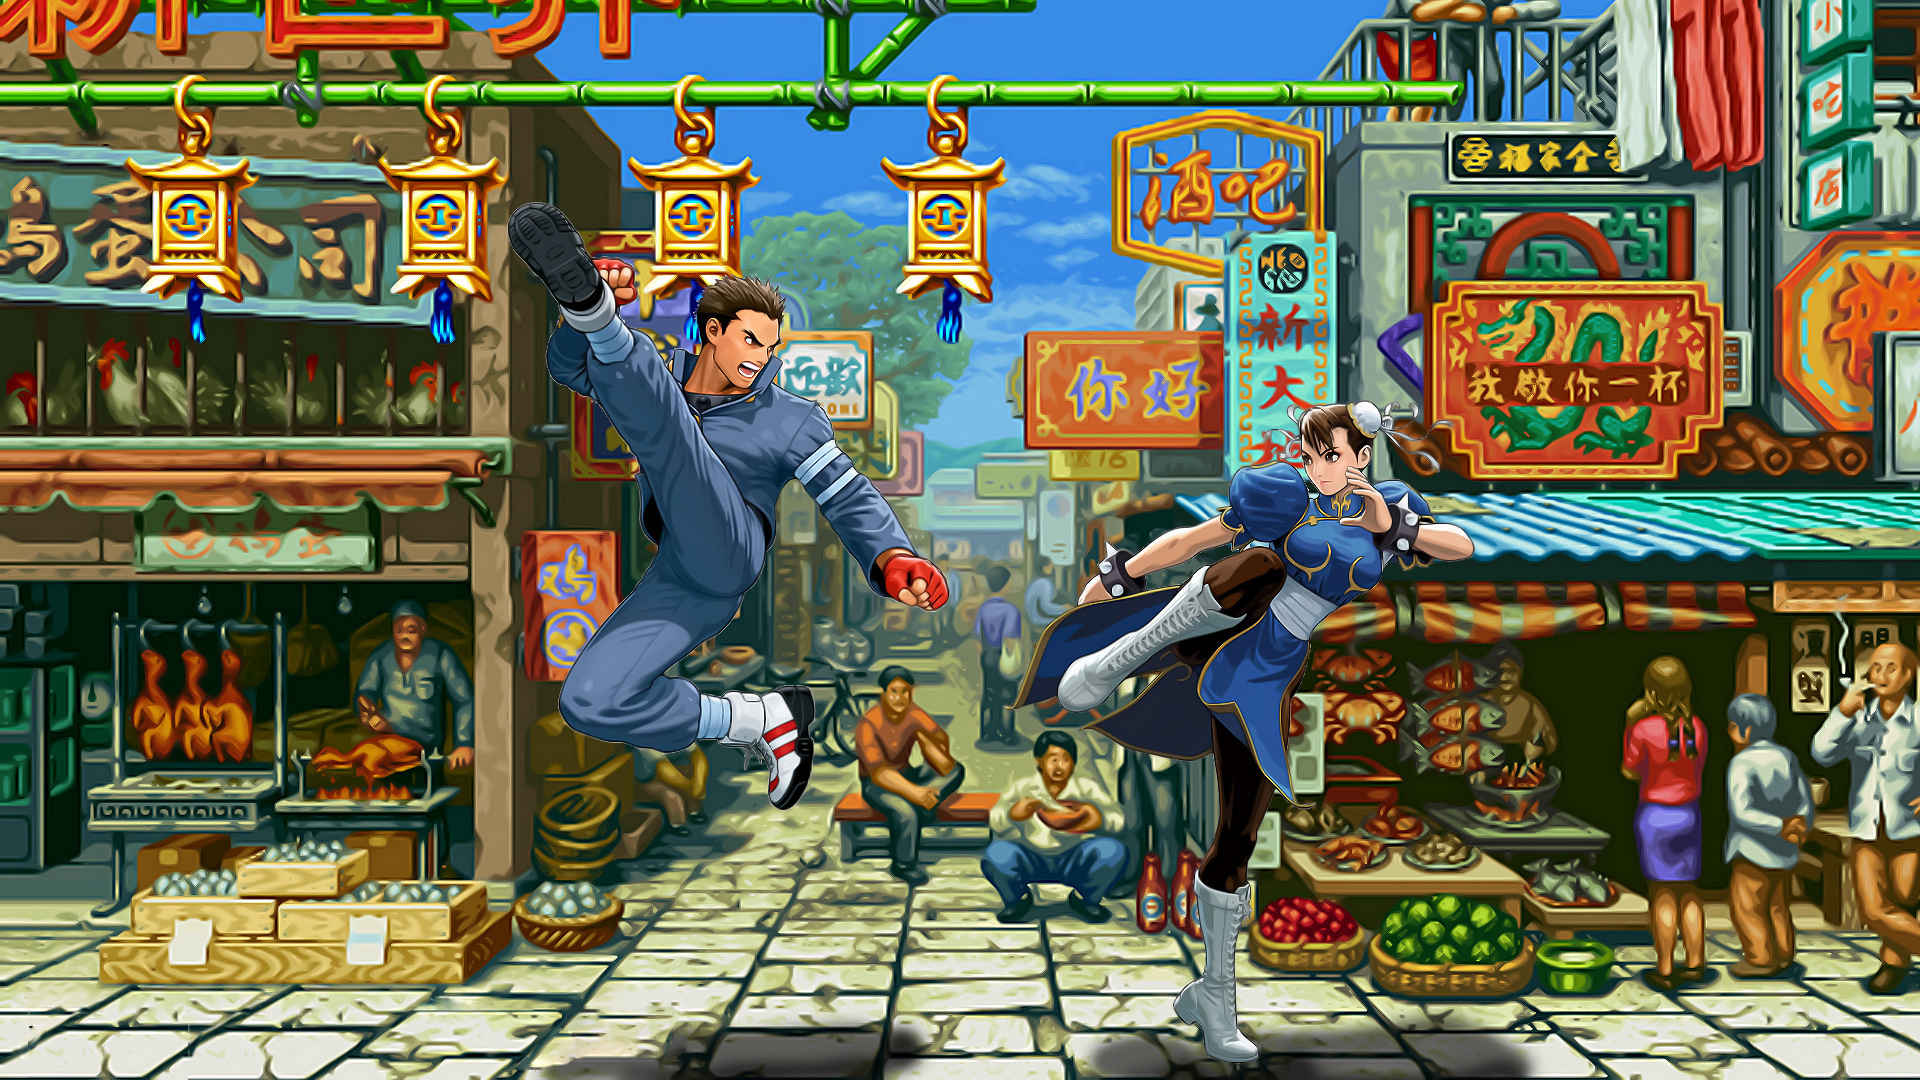 6 street fighter ii the world warrior hd wallpapers - Street fighter 2 wallpaper hd ...